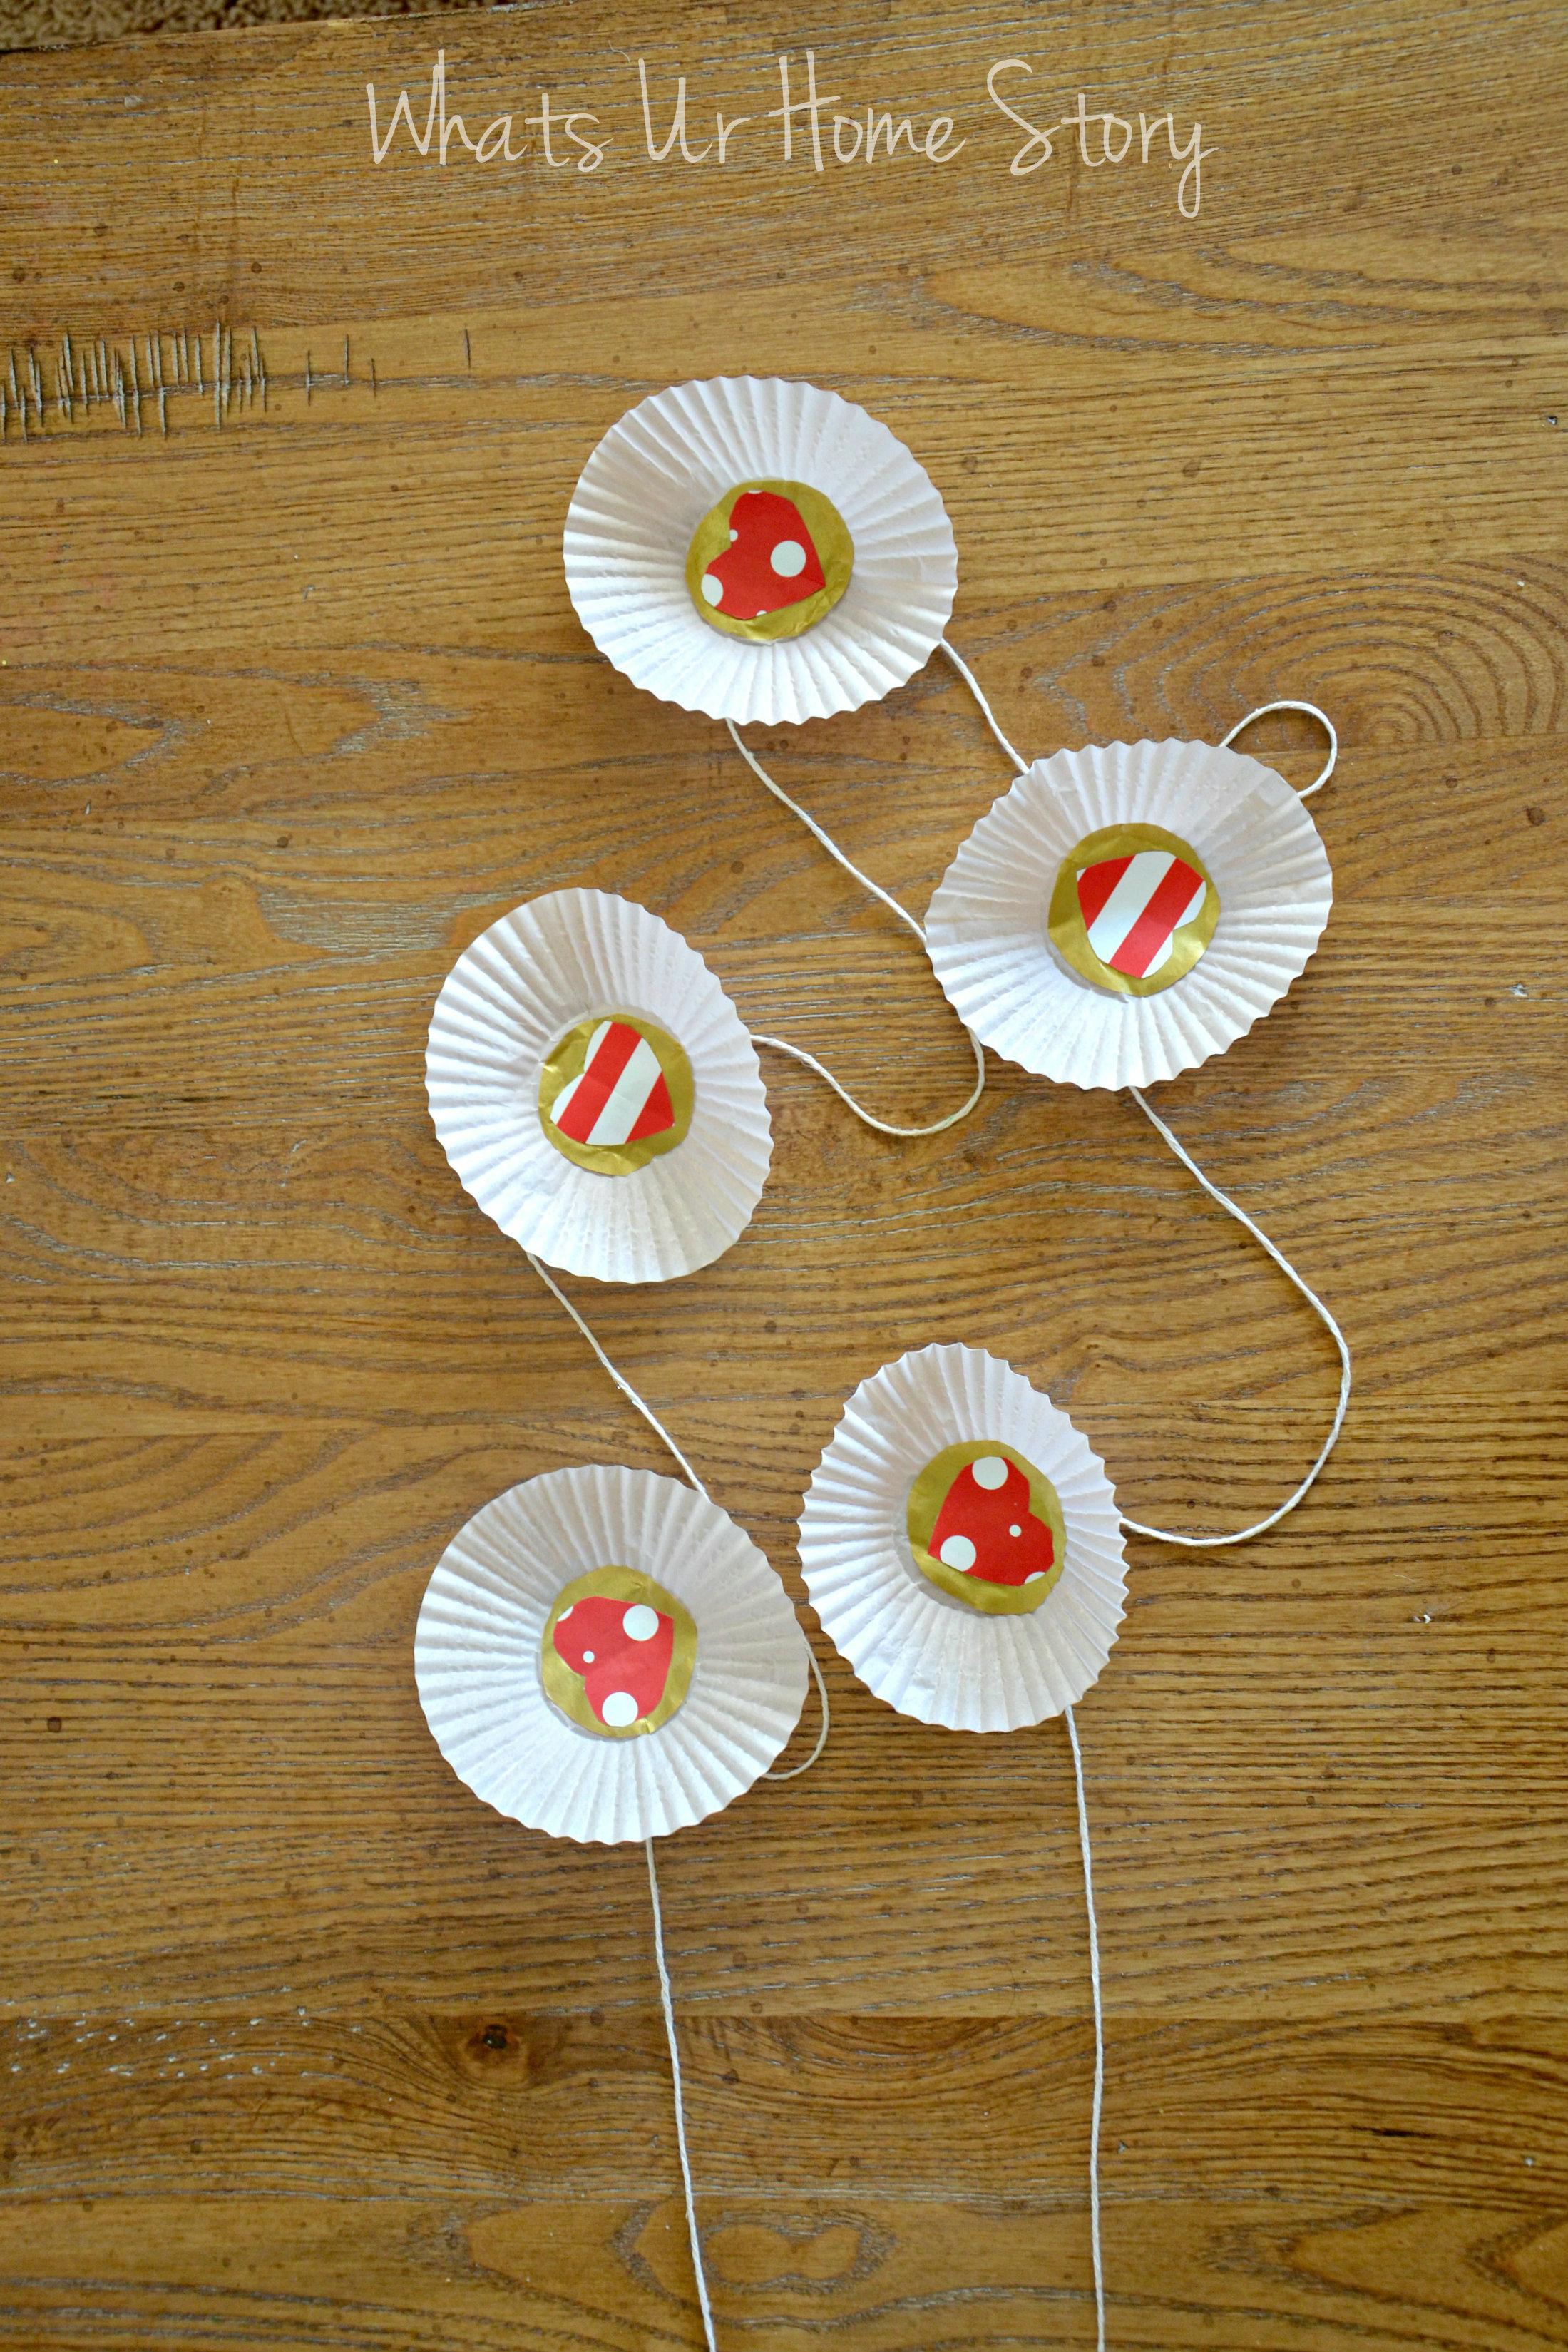 cupcake liner garland,CupcakeLinerValentineGarland,easygarlands,DIYgarlands,cupcakelinercrafts